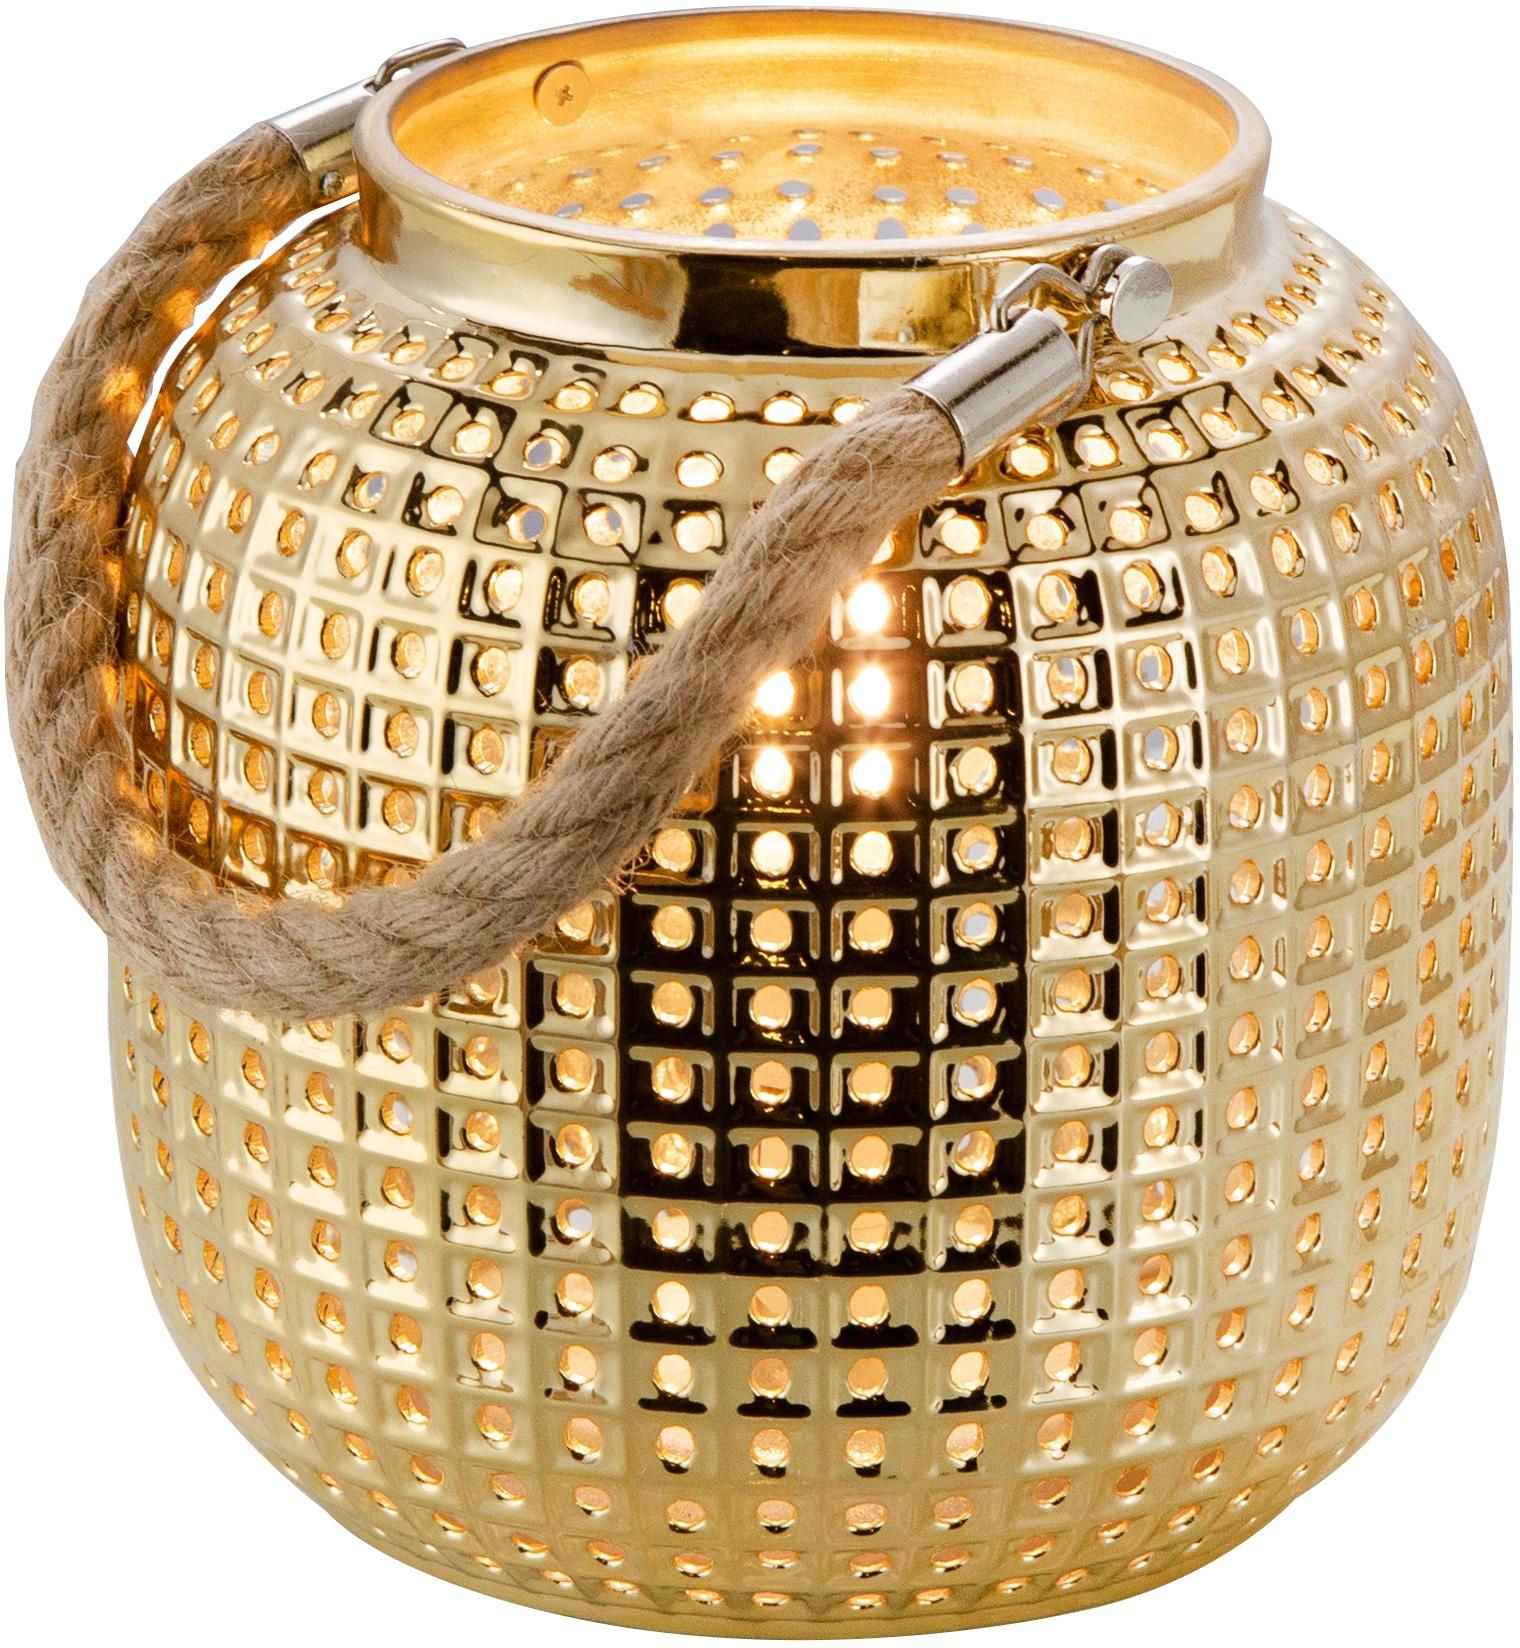 Nino Leuchten Tischleuchte Bola, E14, 1 St.